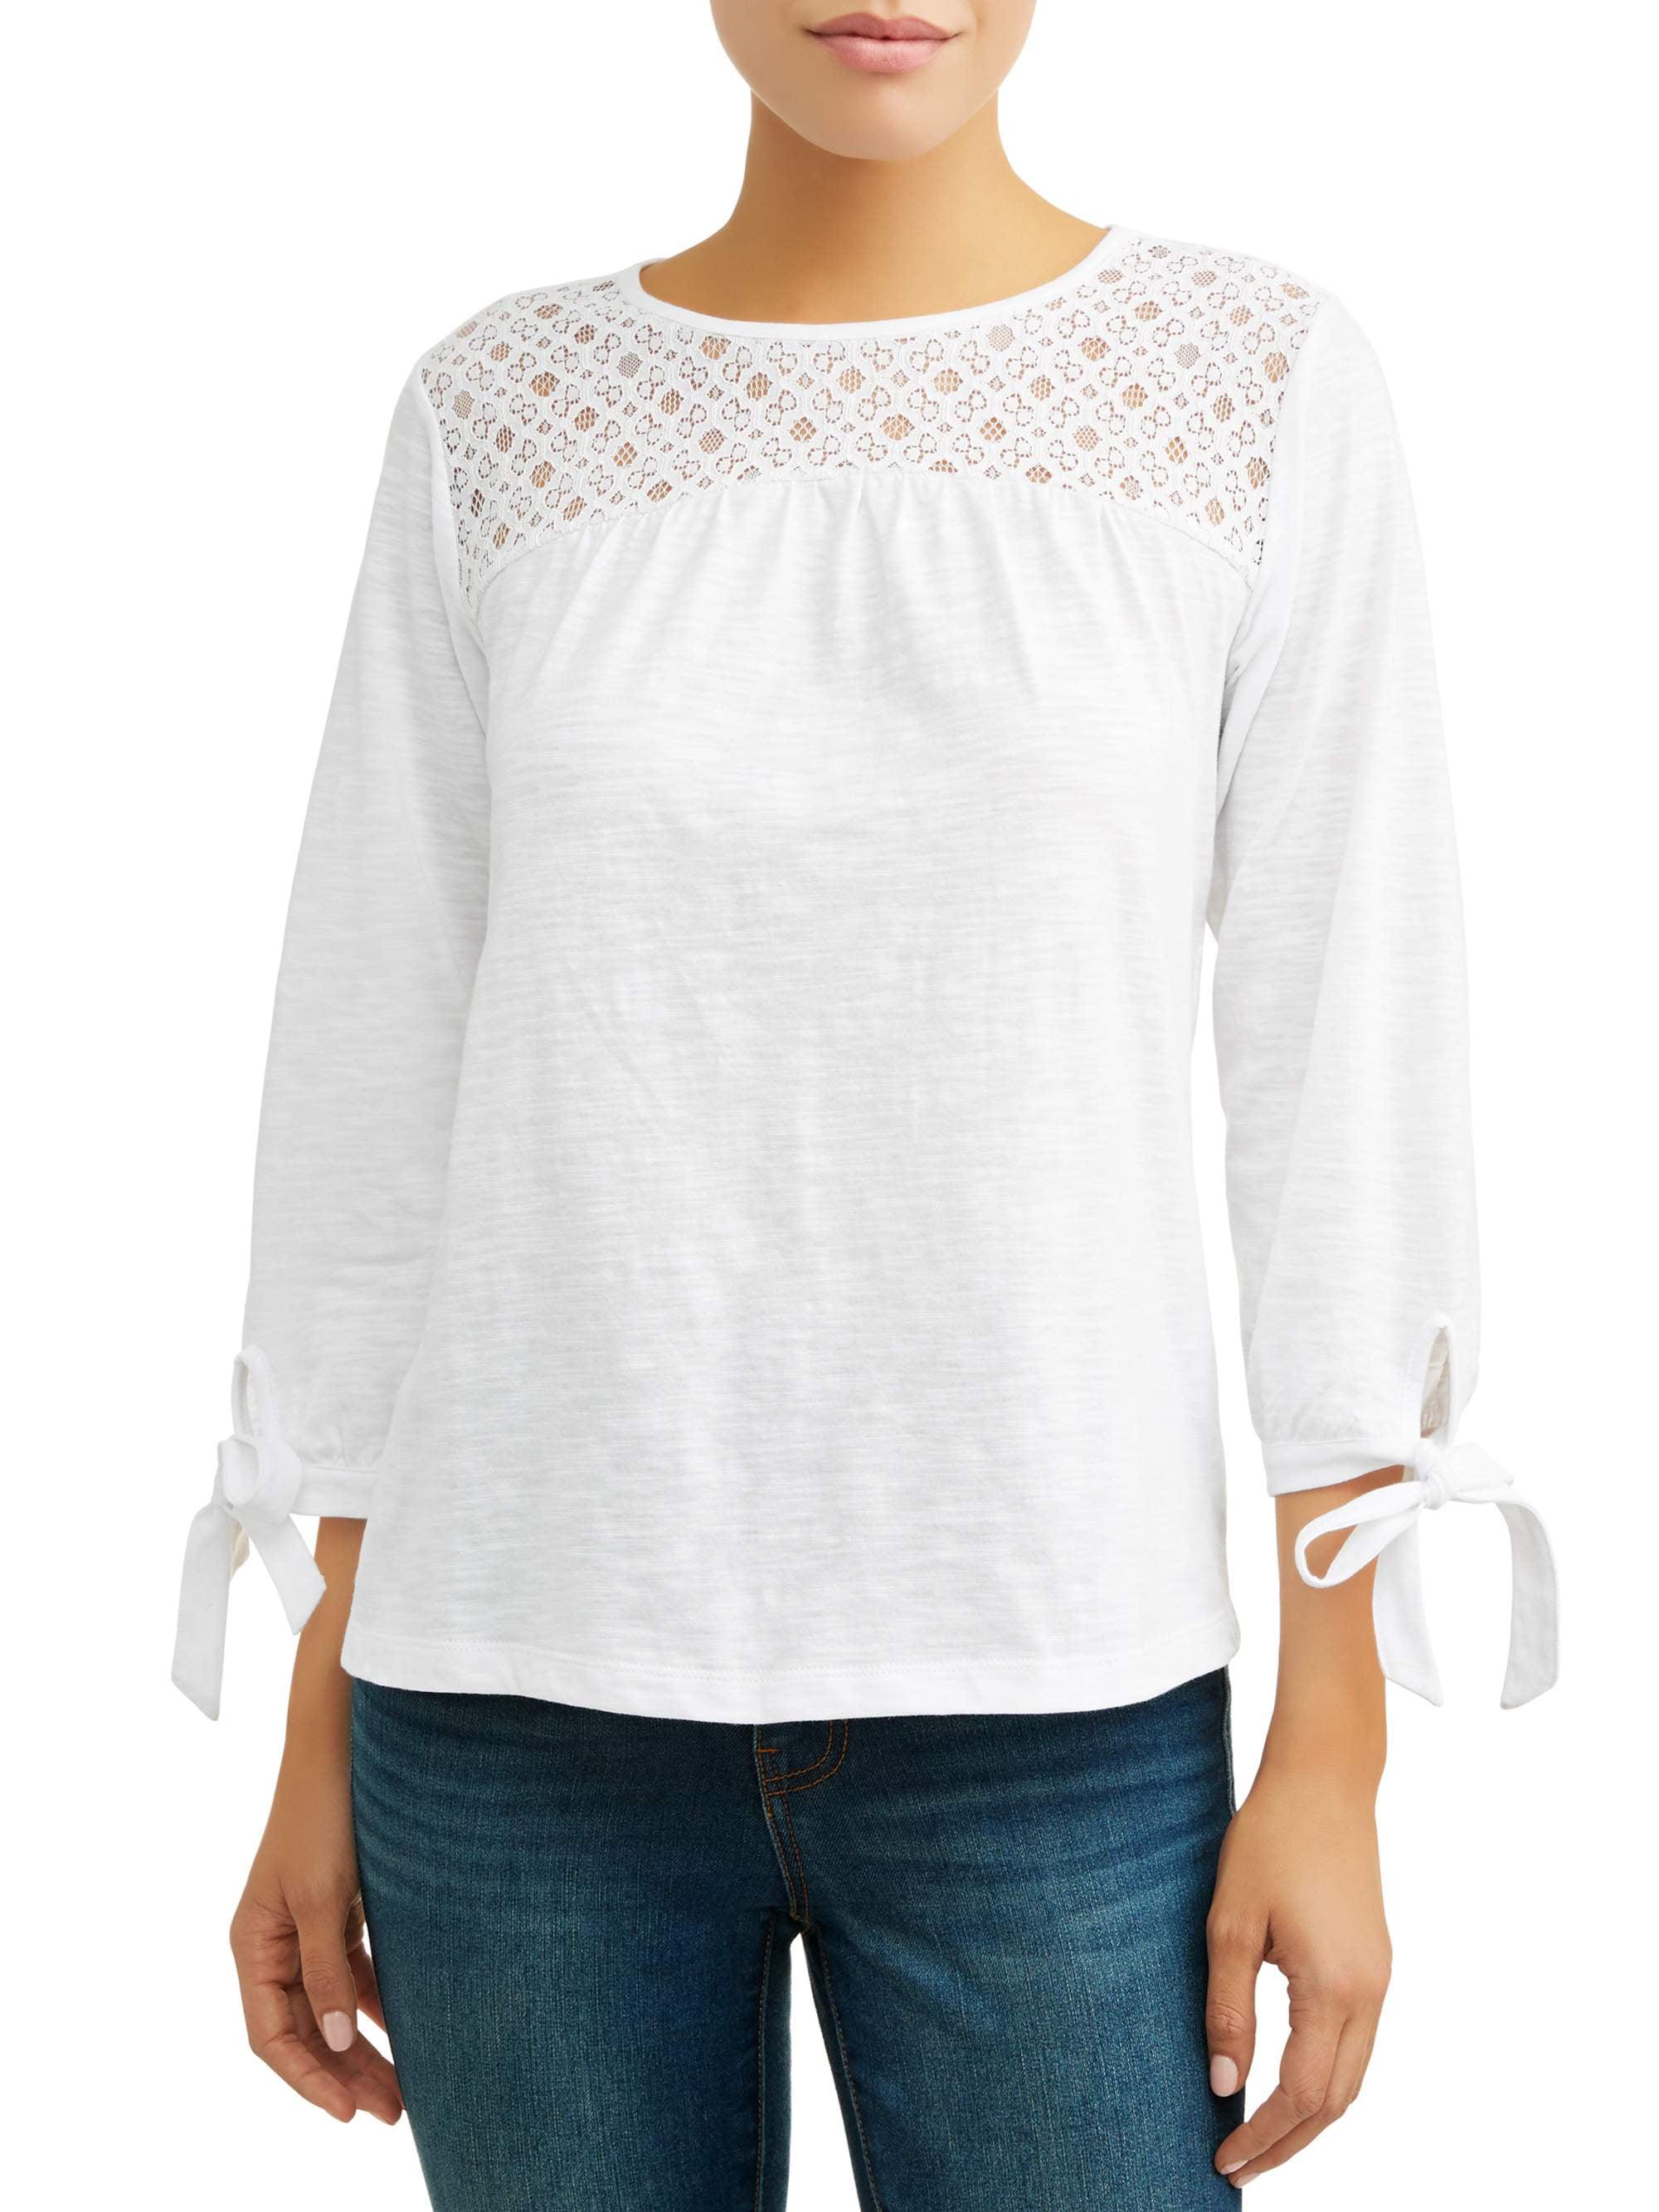 Women's Long Sleeve Lace Yoke Peasant Top